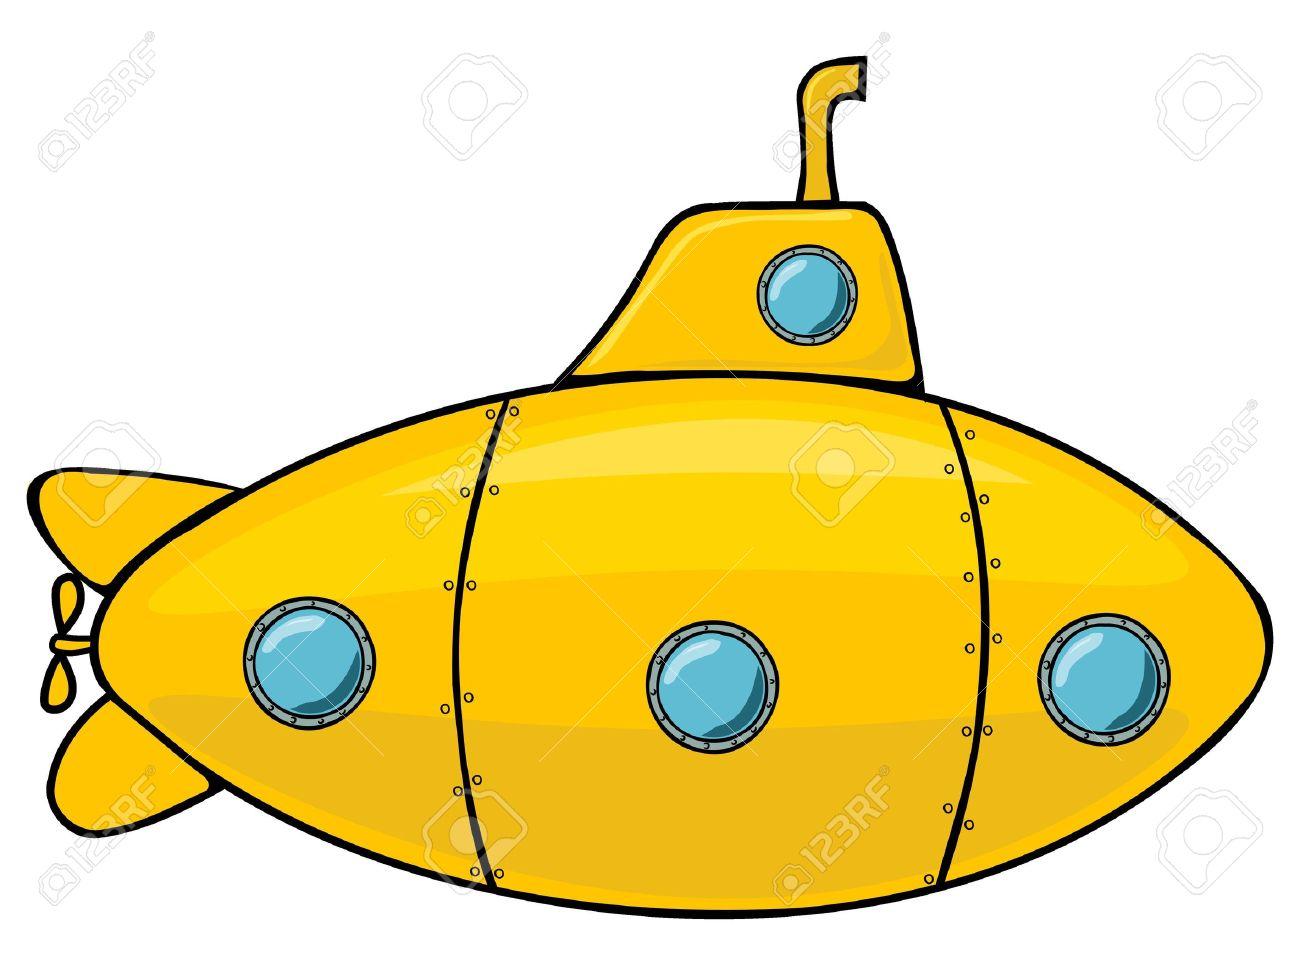 933 Submarine free clipart.